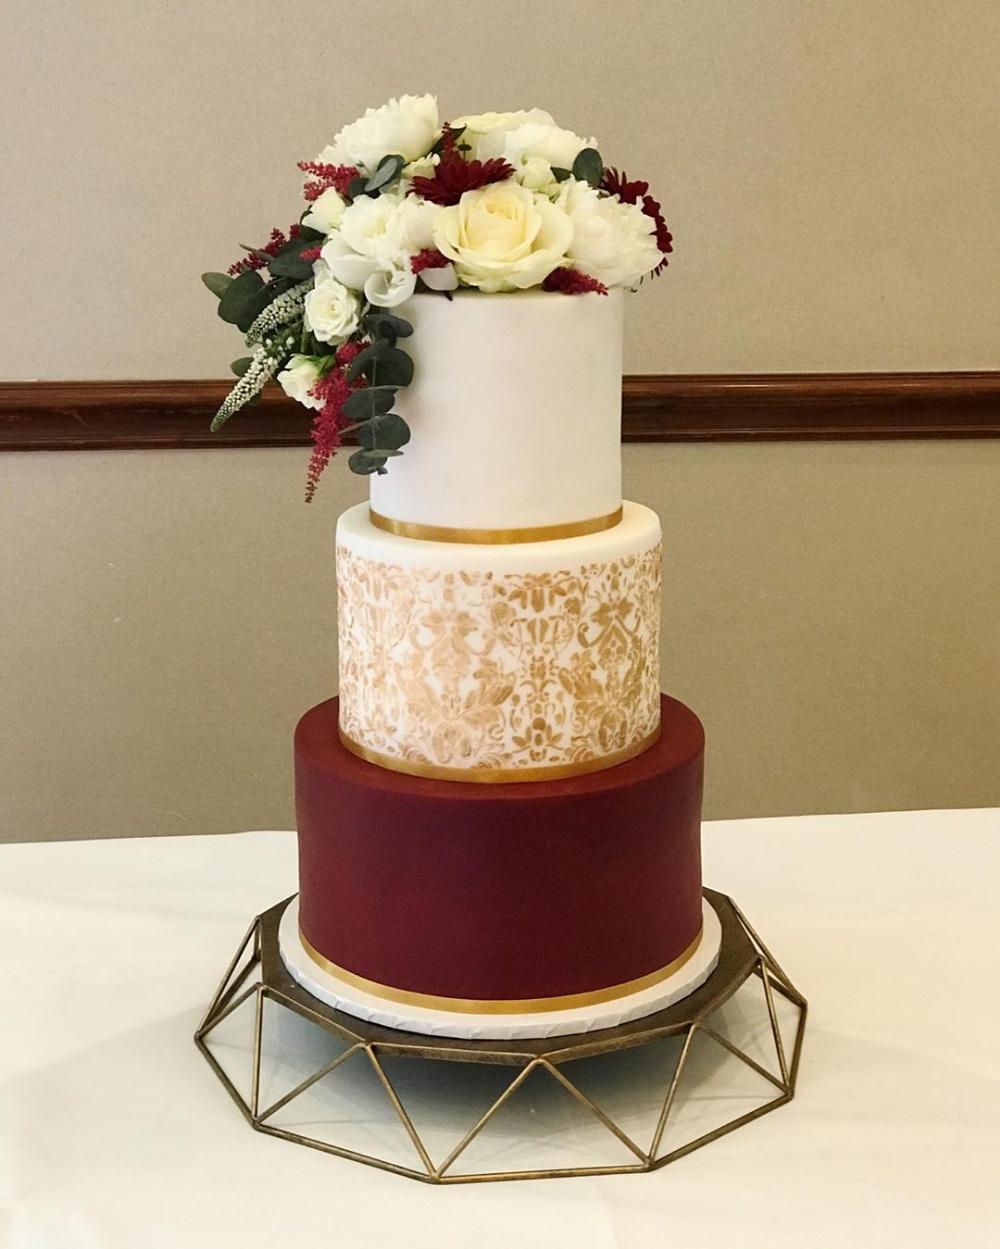 Indian Style Wedding Cake Burgundy Wedding Cake Burgundy And Gold Cake Burgundy Wedding Cake Wedding Cake Burgundy Gold Wedding Cake Red